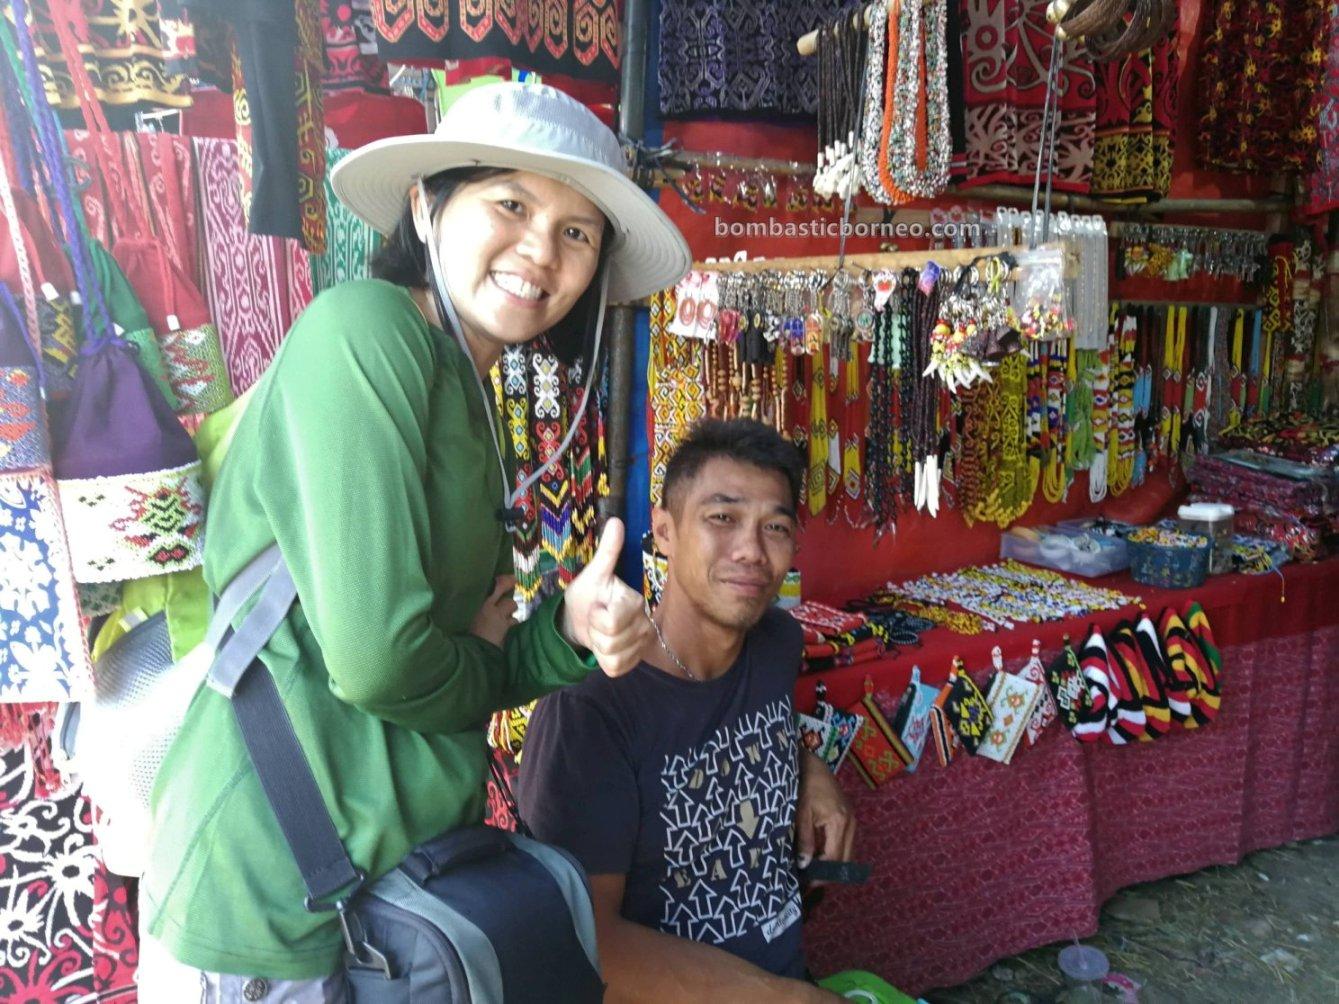 Gawai Dayak, backpackers, destination, culture, event, Borneo, Indonesia, native, tribe, Obyek wisata, Tourism, travel guide, 印尼西加里曼丹, 原住民丰收节